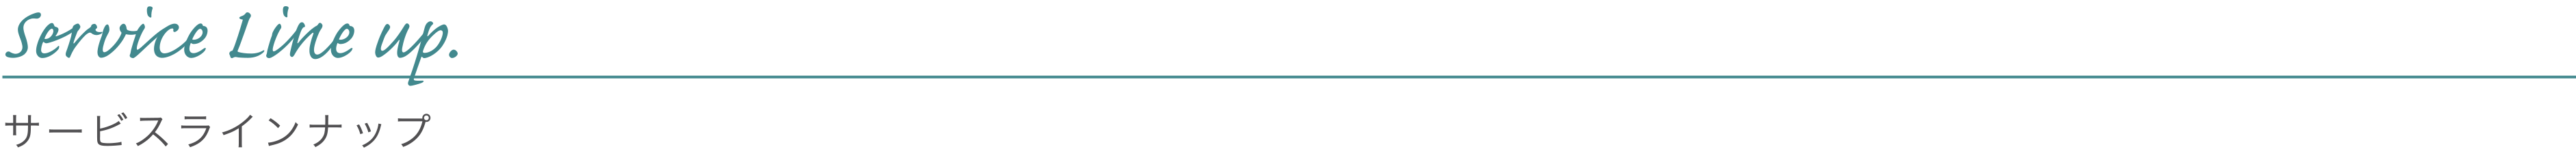 Service Outline / サービスラインナップ